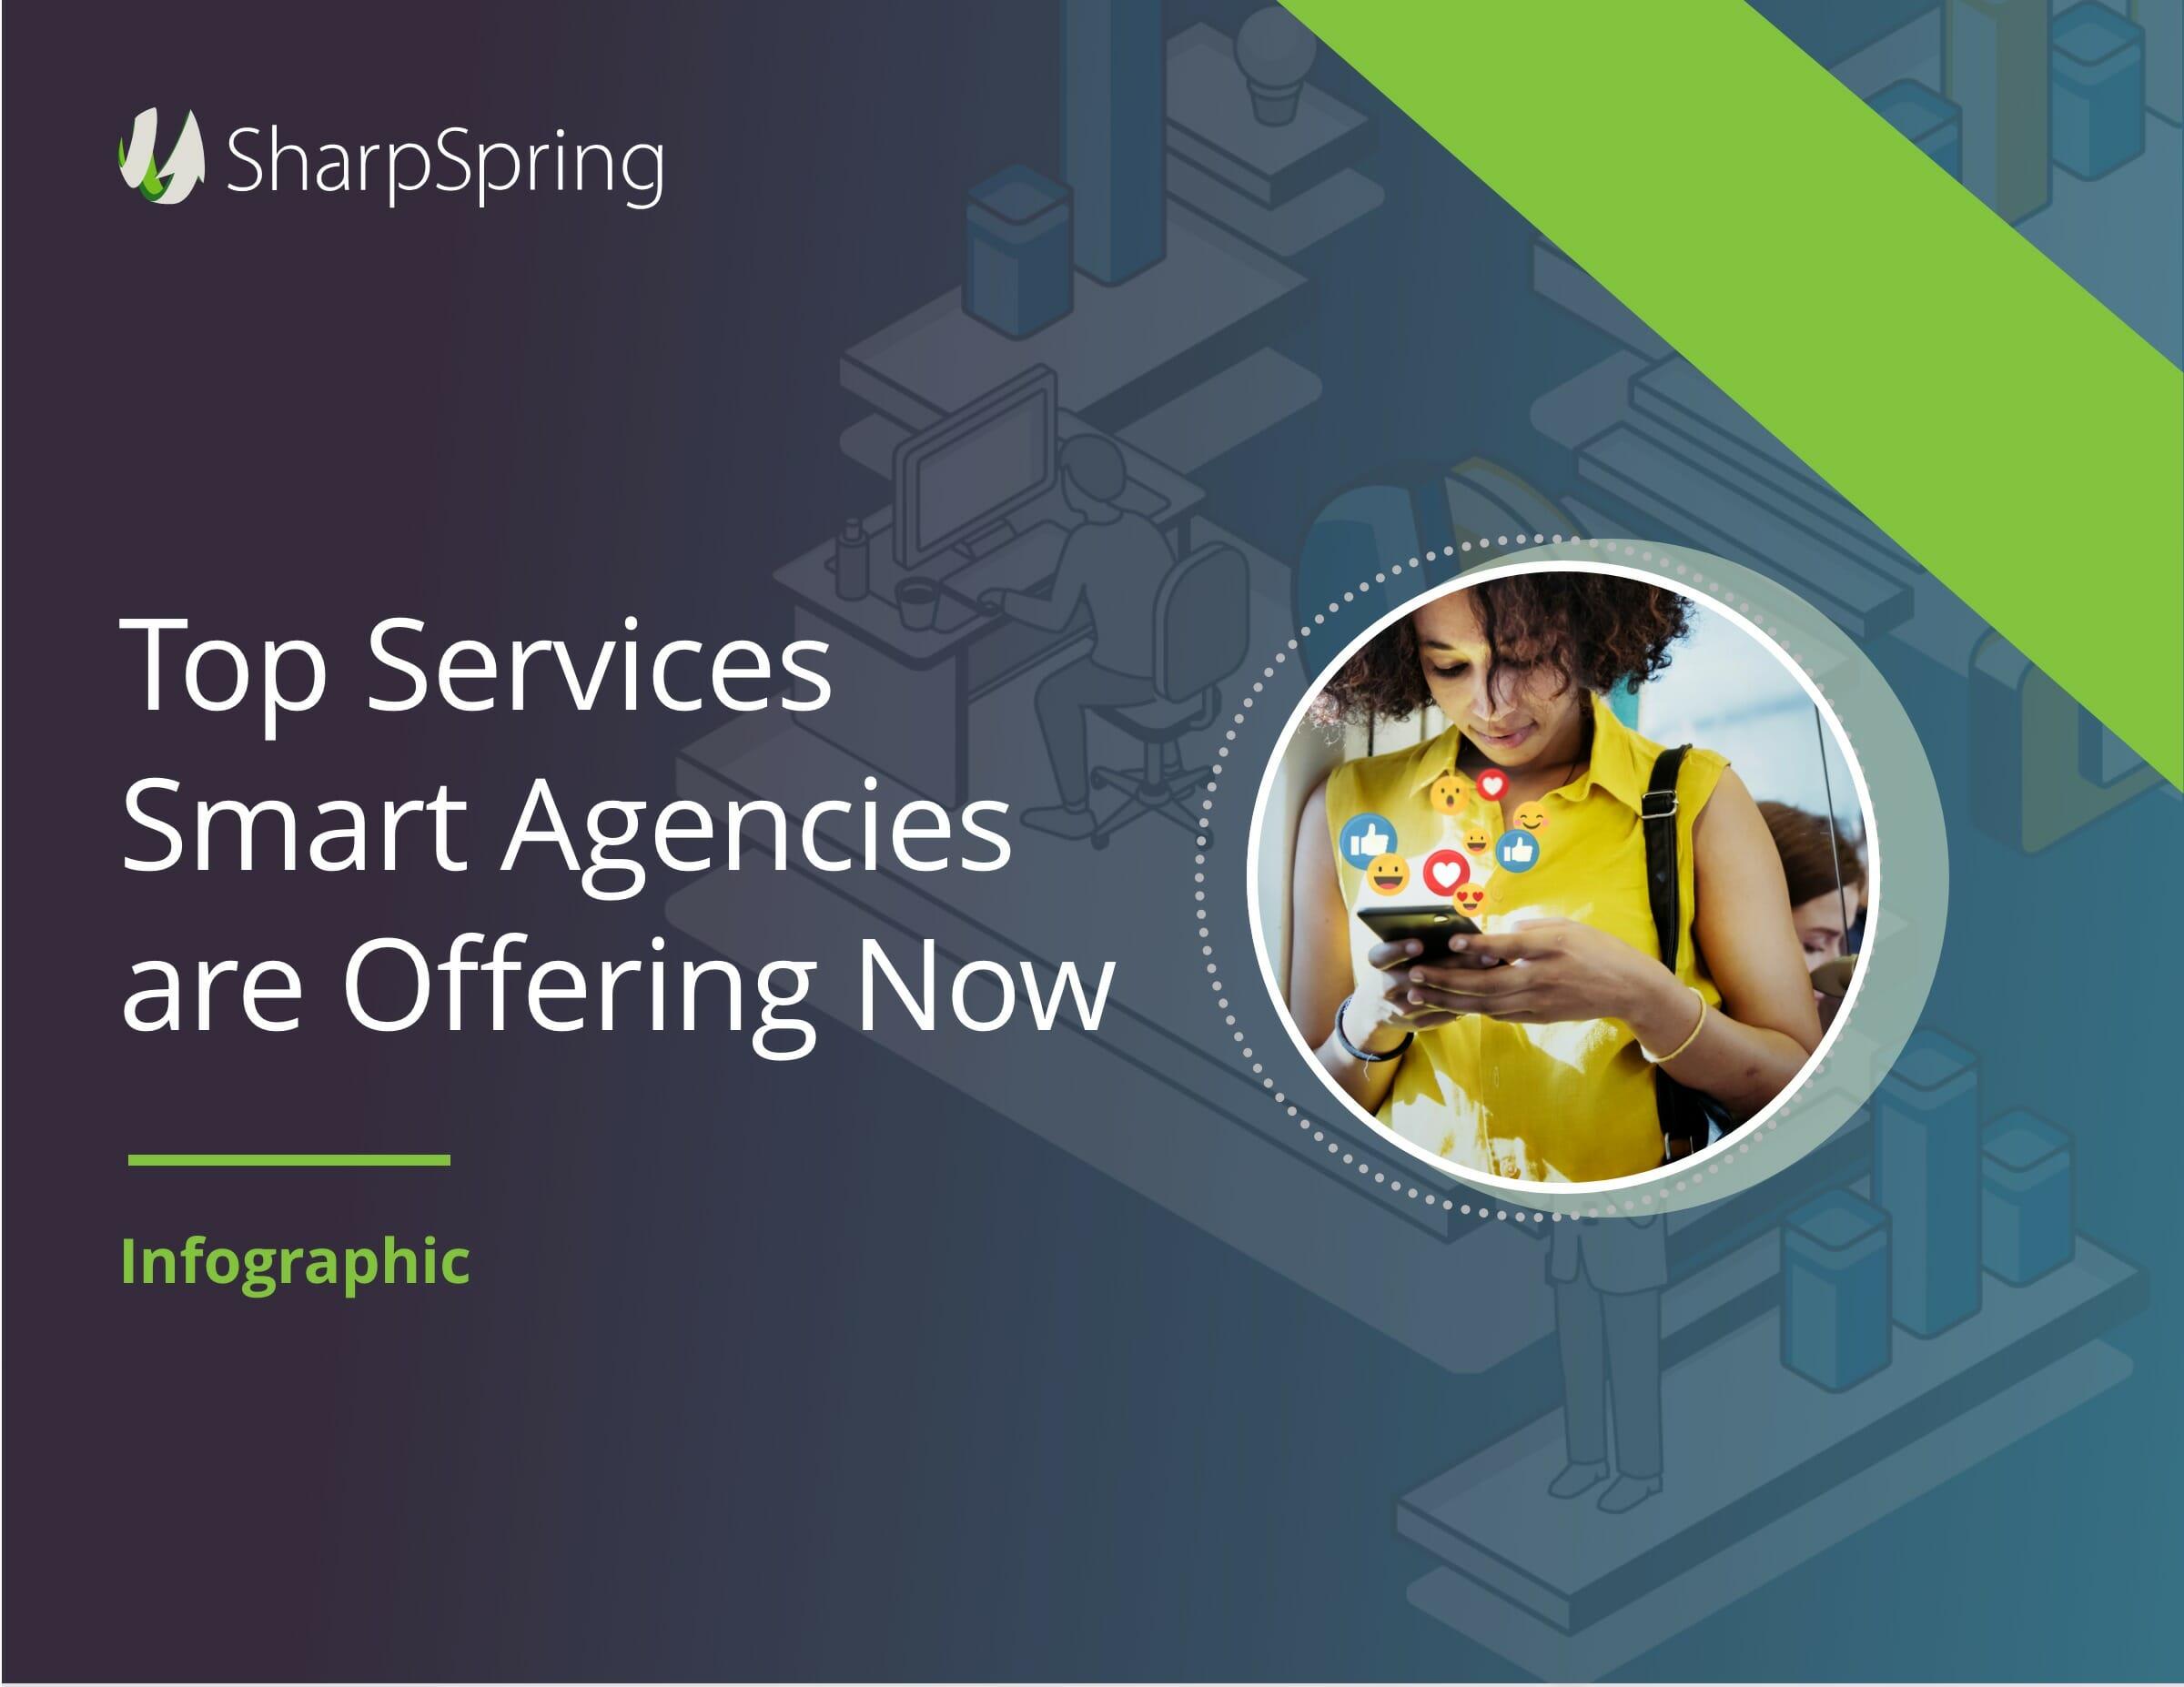 Top-Services Intelligente Agenturen bieten jetzt